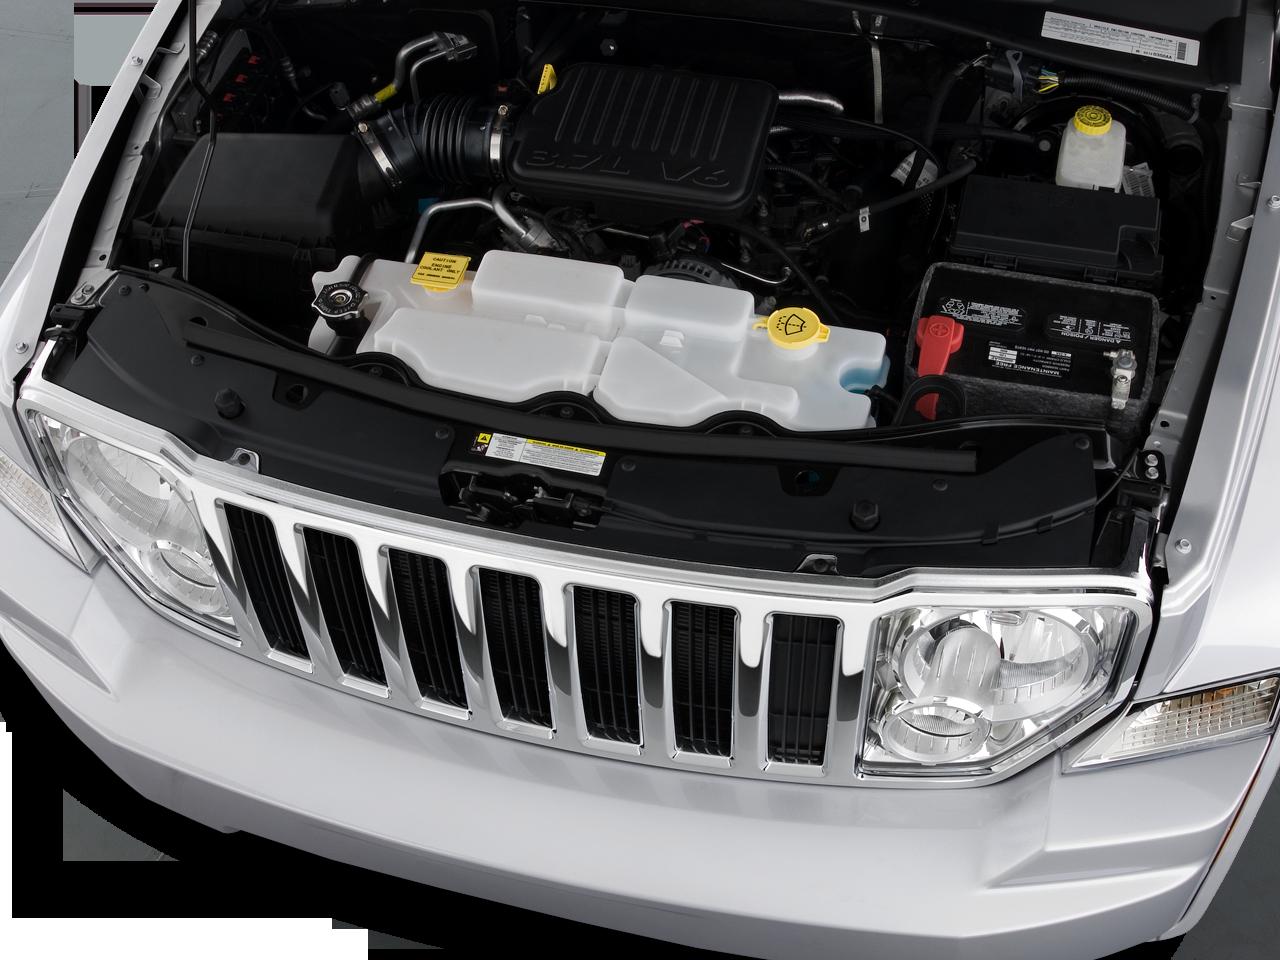 2010 jeep liberty renegade - editor's notebook - automobile magazine